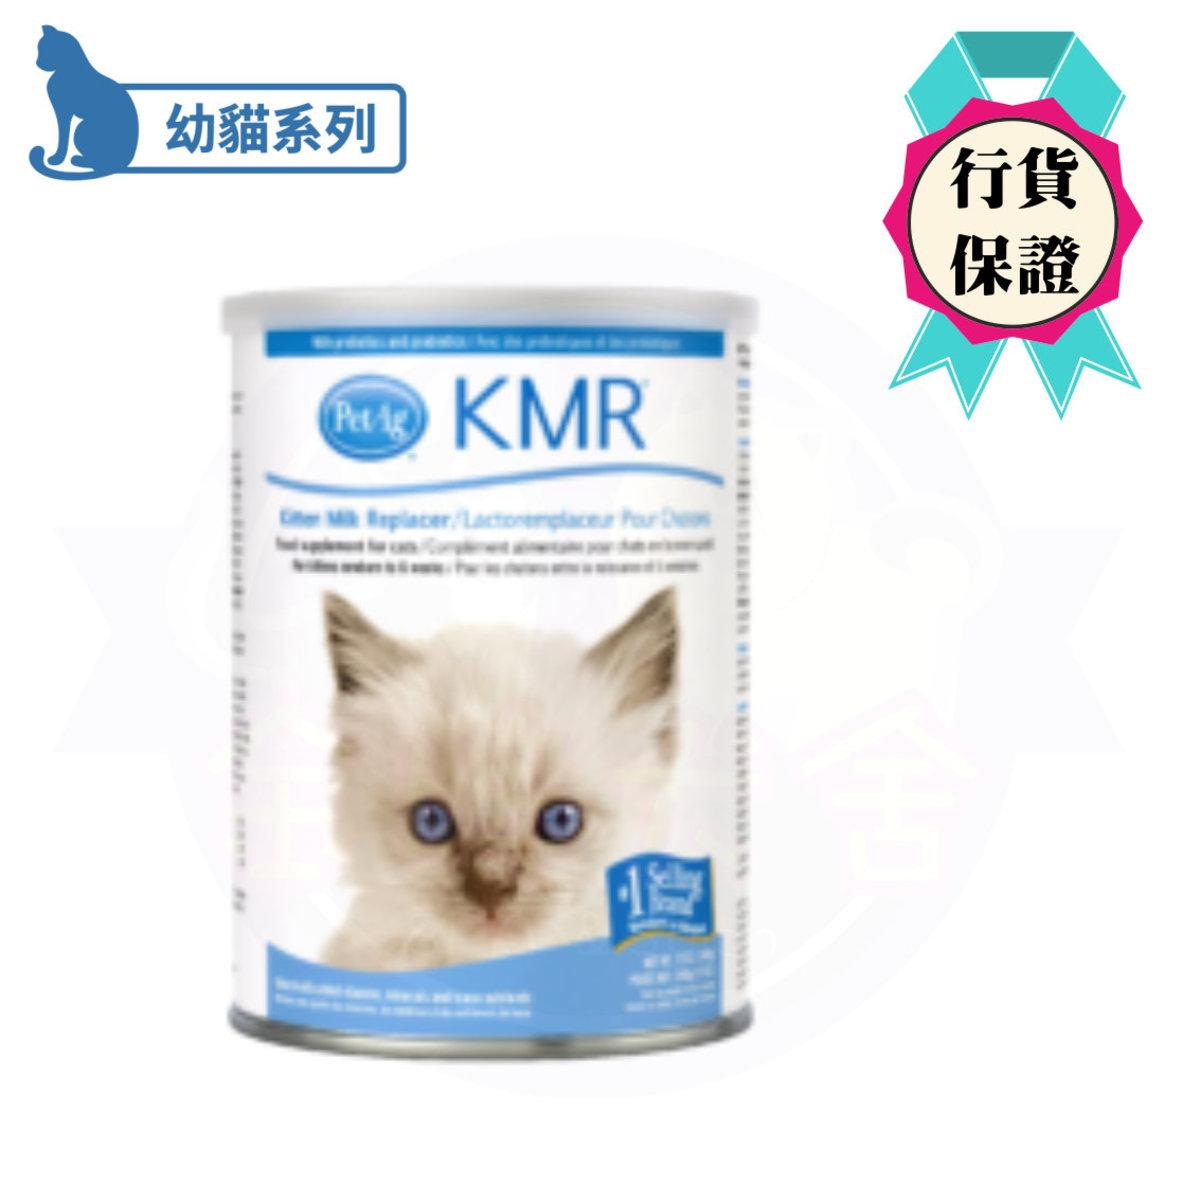 KMR -Kitten Milk Replacer Powder 340g